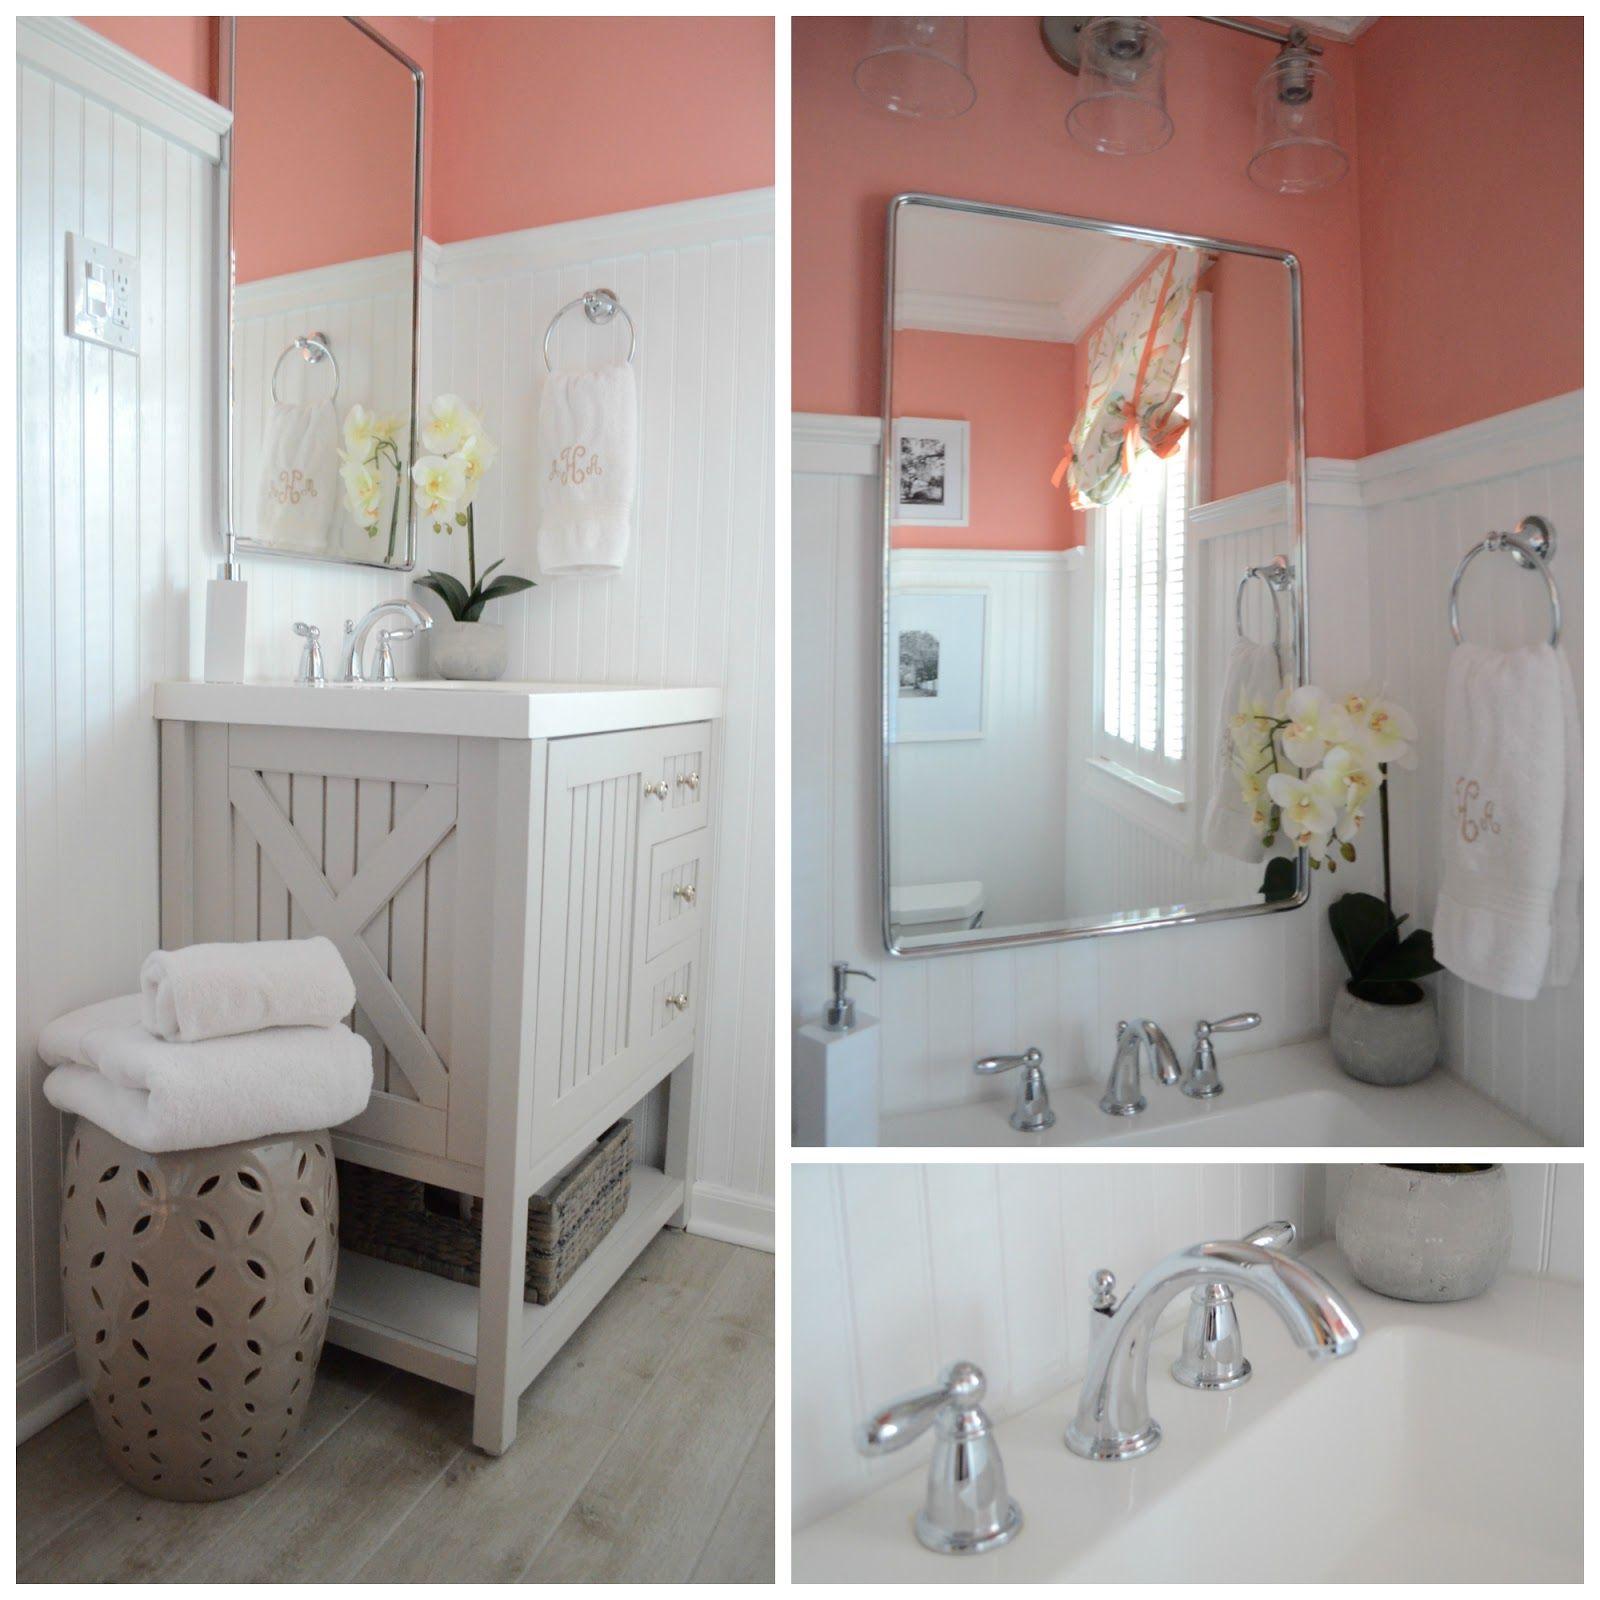 The Houston House: Hall Bathroom: Sources   Paint colors   Pinterest ...